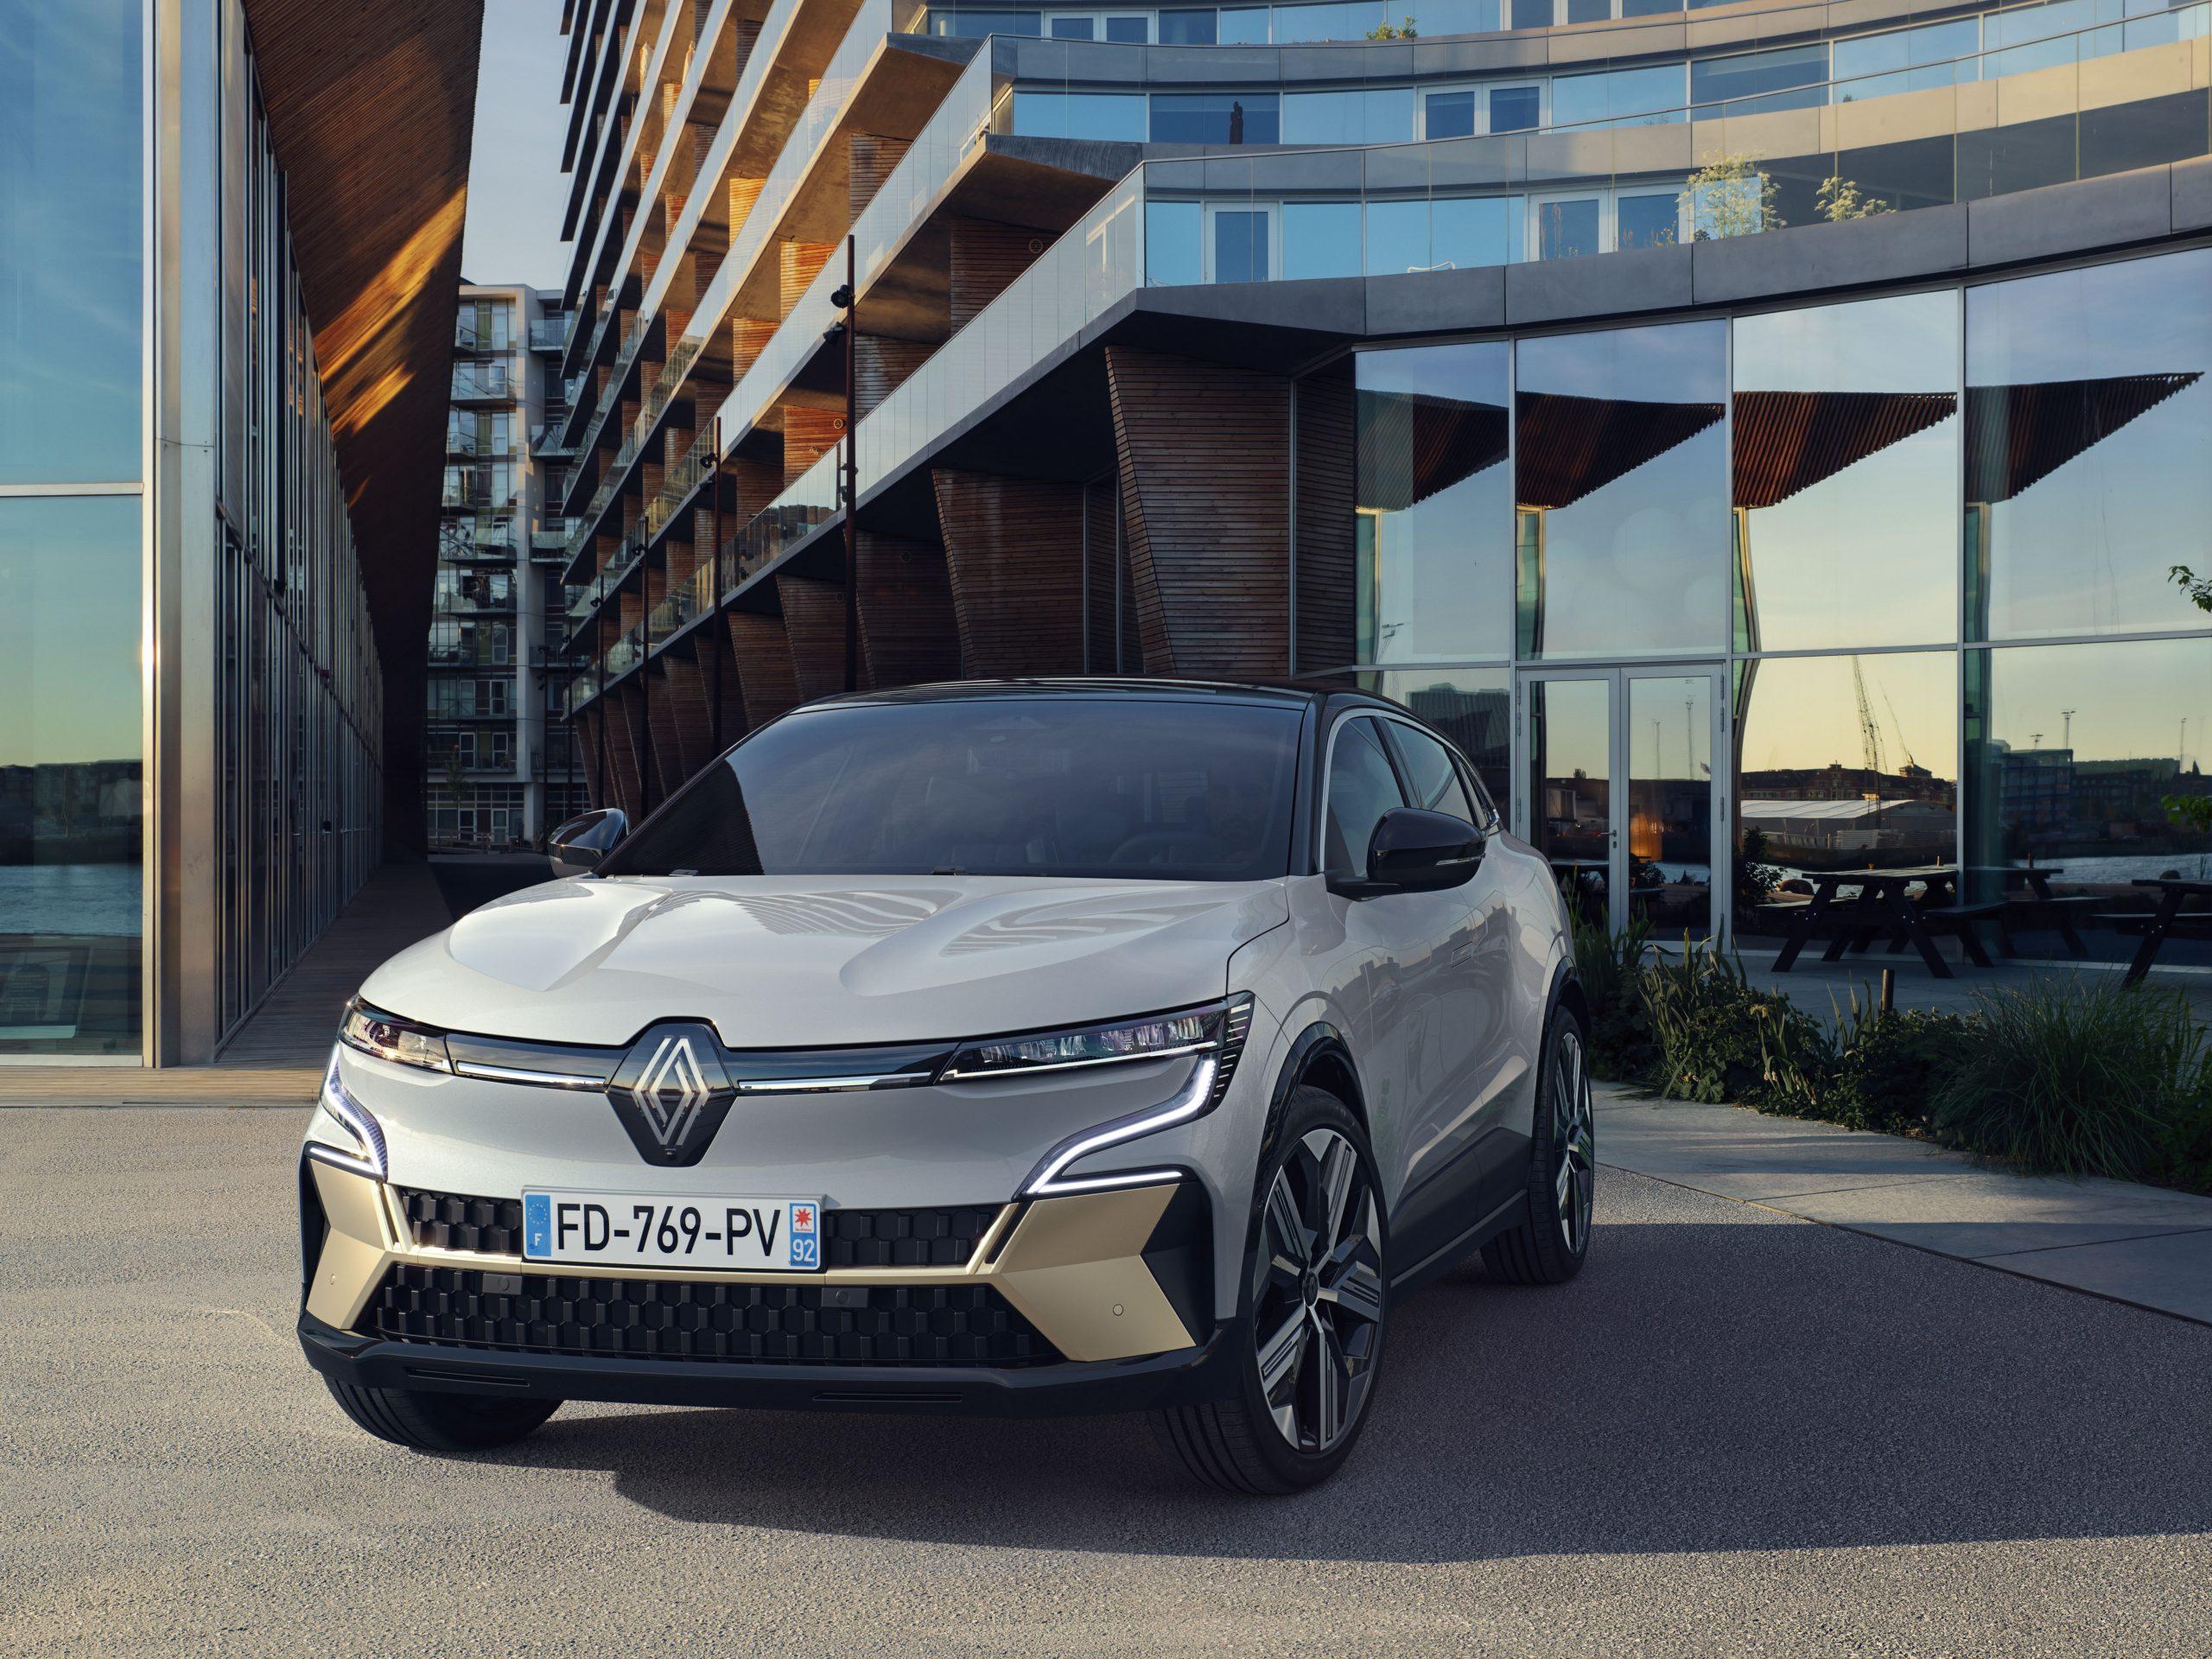 Megane, SUV, auto, automobil Renault